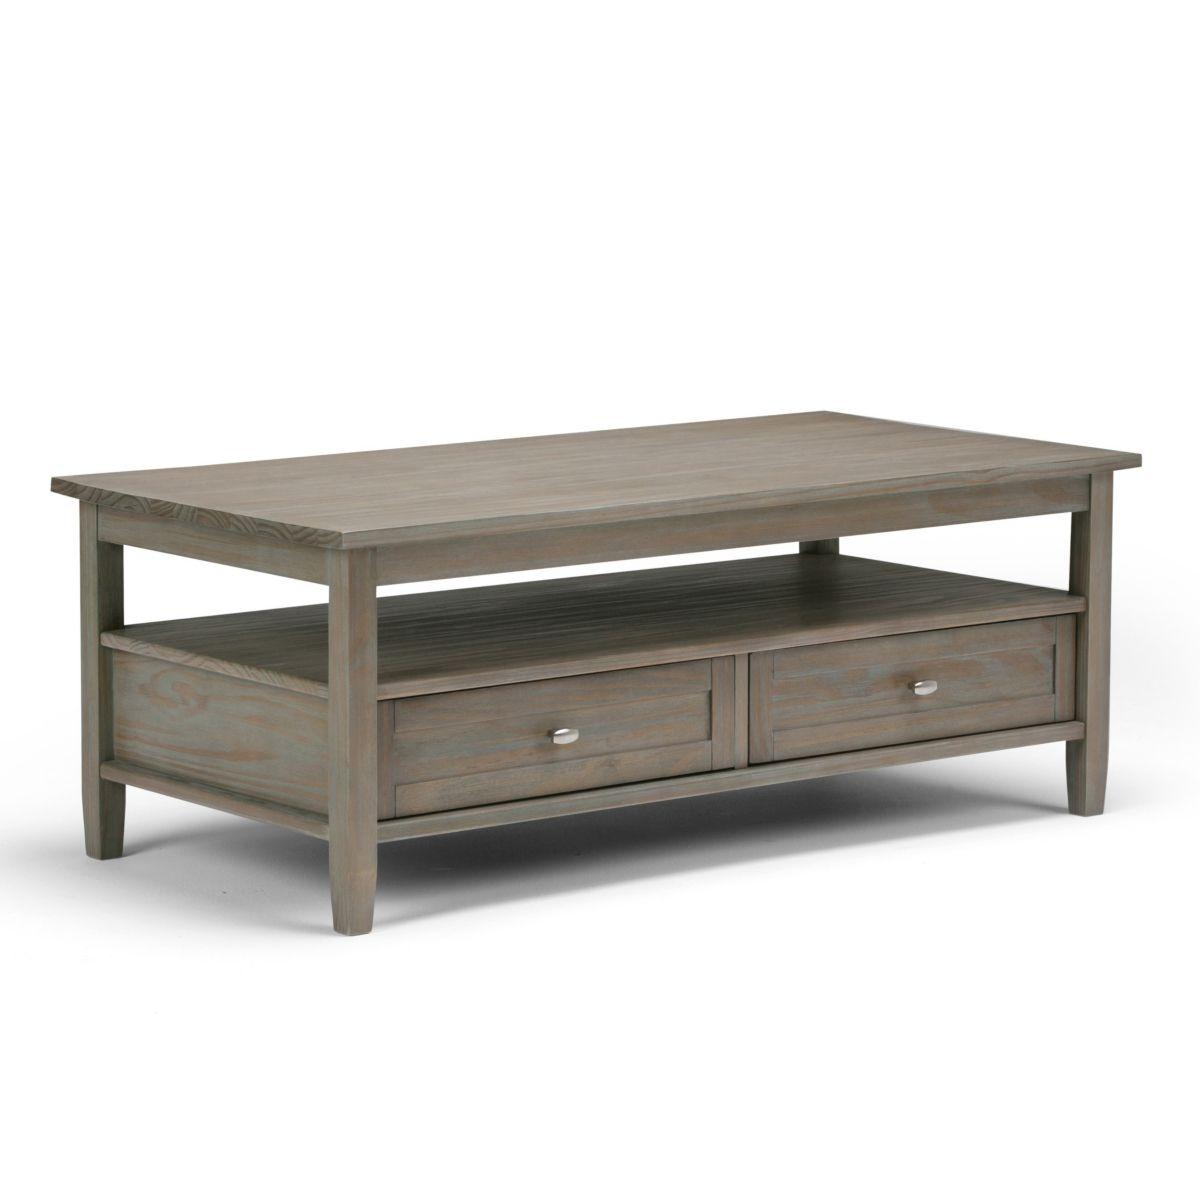 Simpli Home Burbank Coffee Table Reviews Furniture Macy S Rectangle Coffee Table Wood Coffee Table With Drawers Coffee Table Wood [ 1200 x 1200 Pixel ]